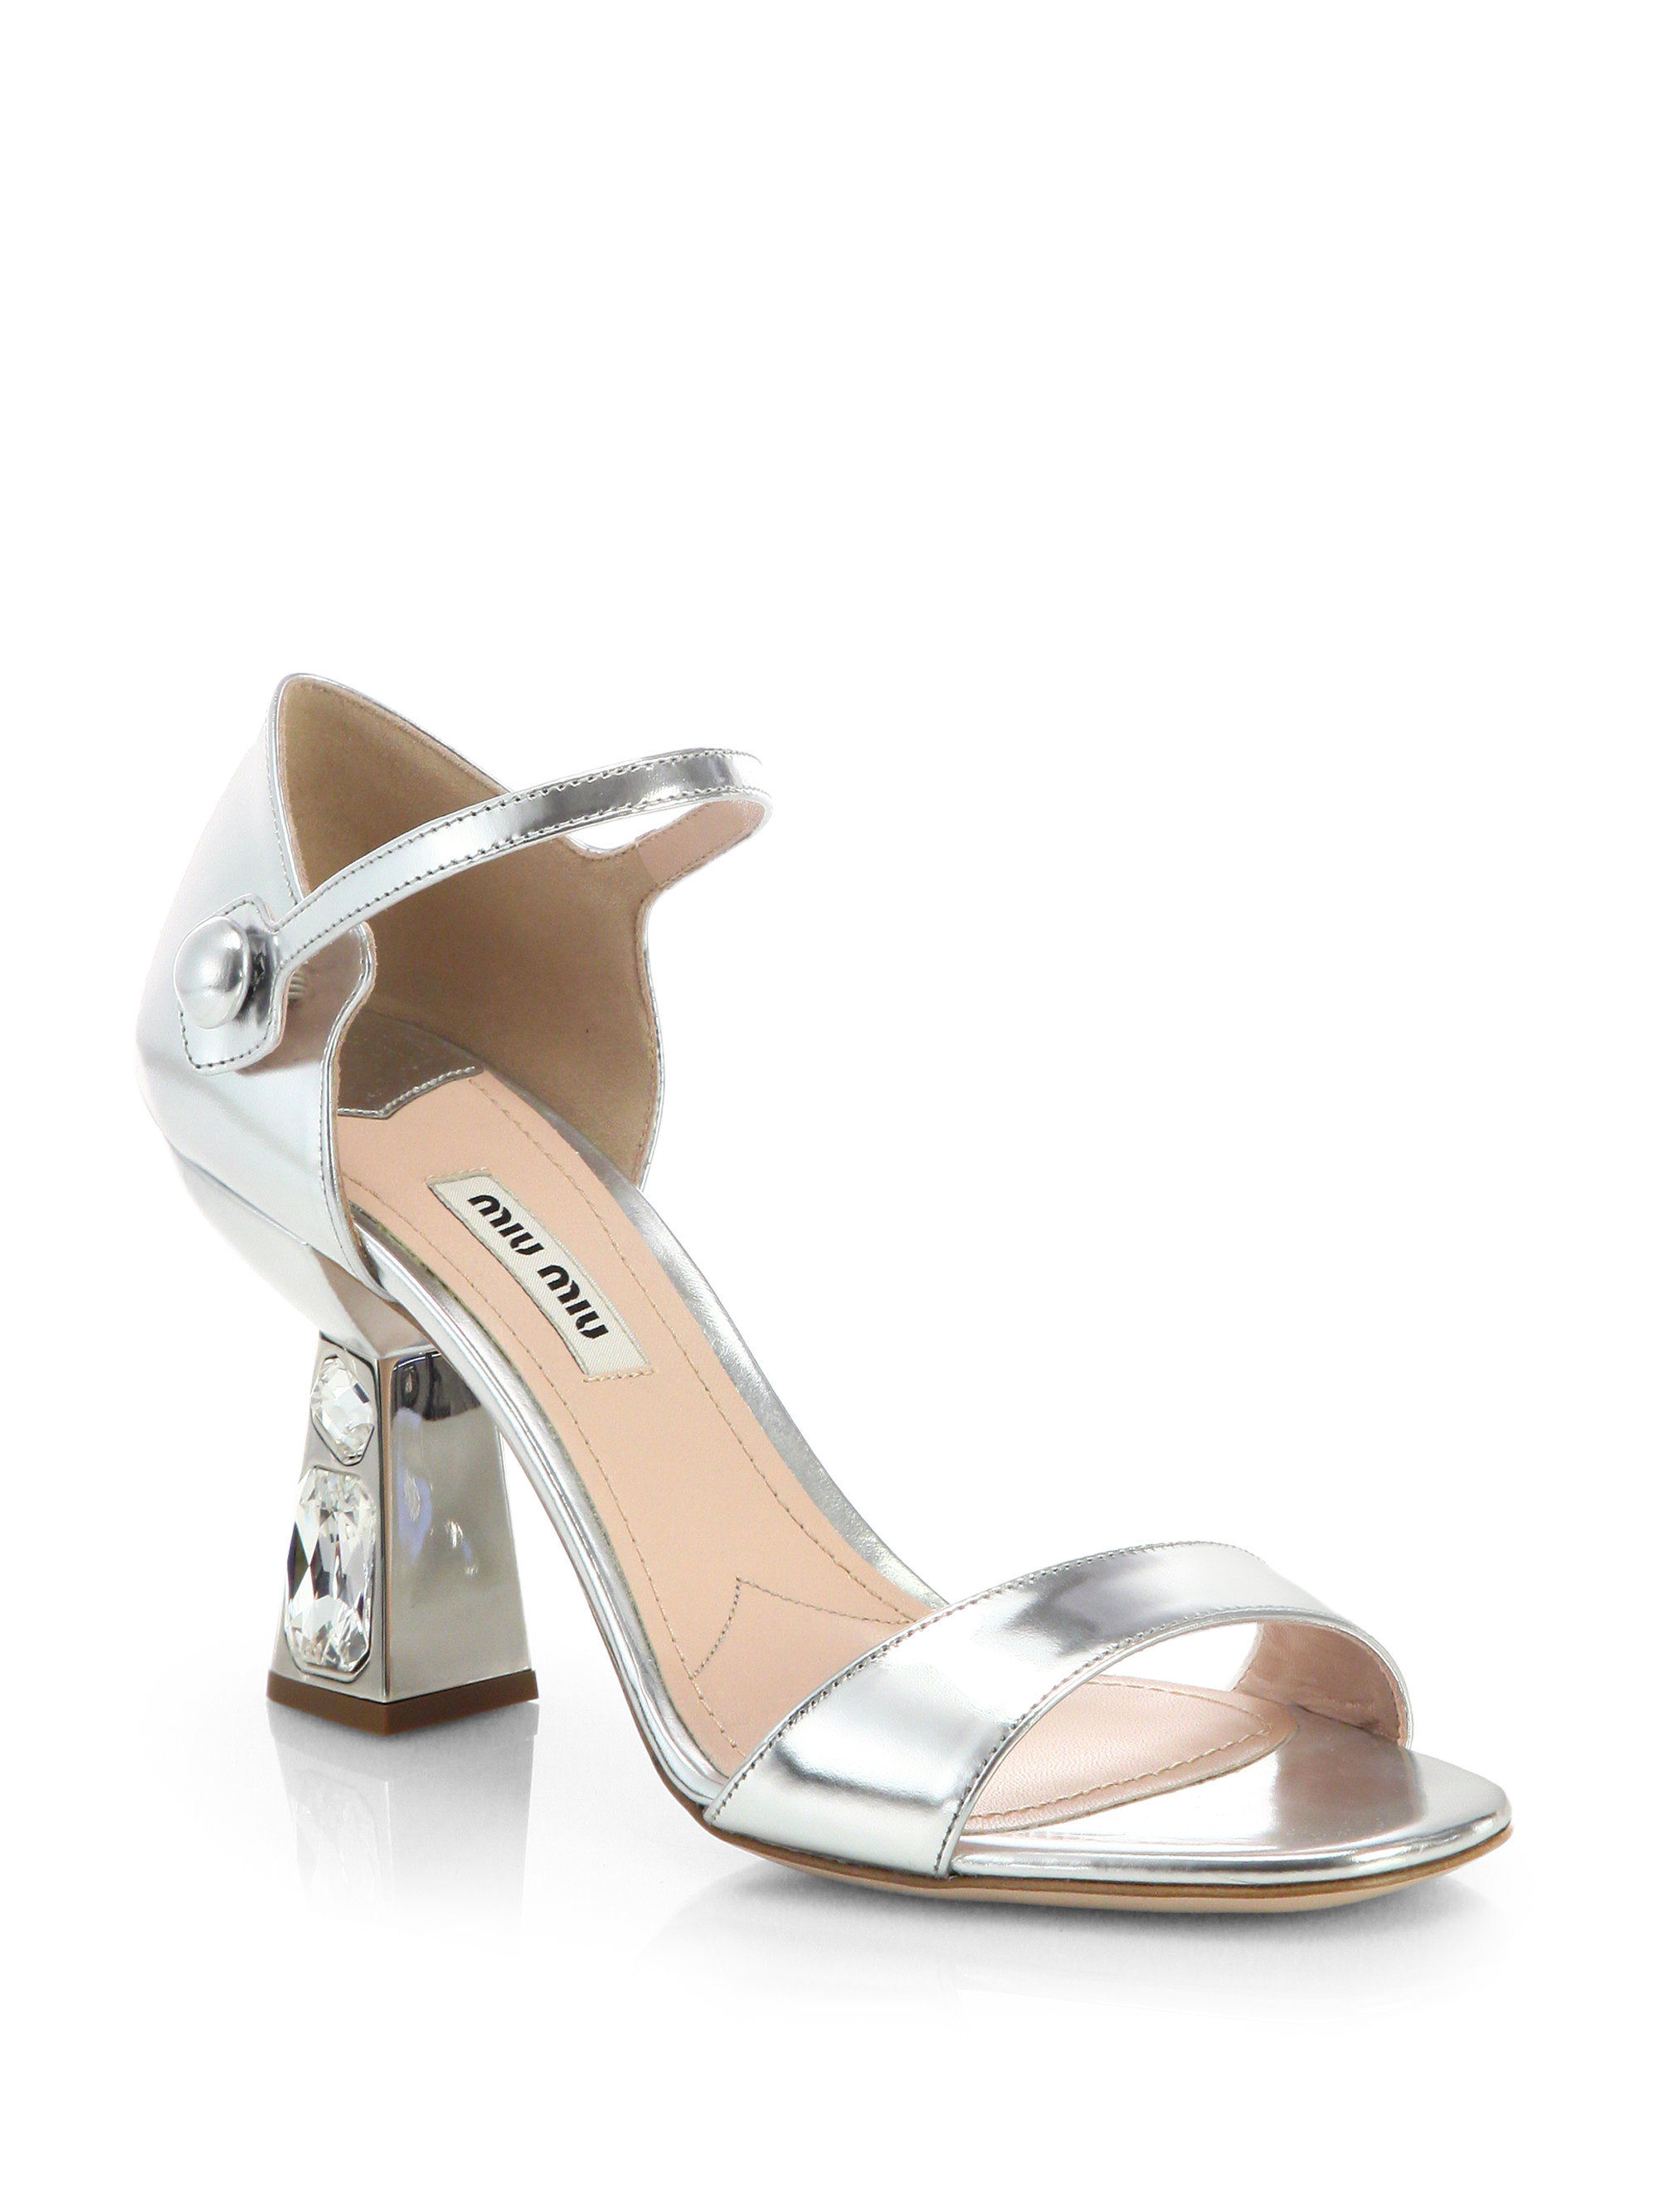 2d41313ff4912a Lyst - Miu Miu Metallic Leather Jeweled-Heel Sandals in Metallic